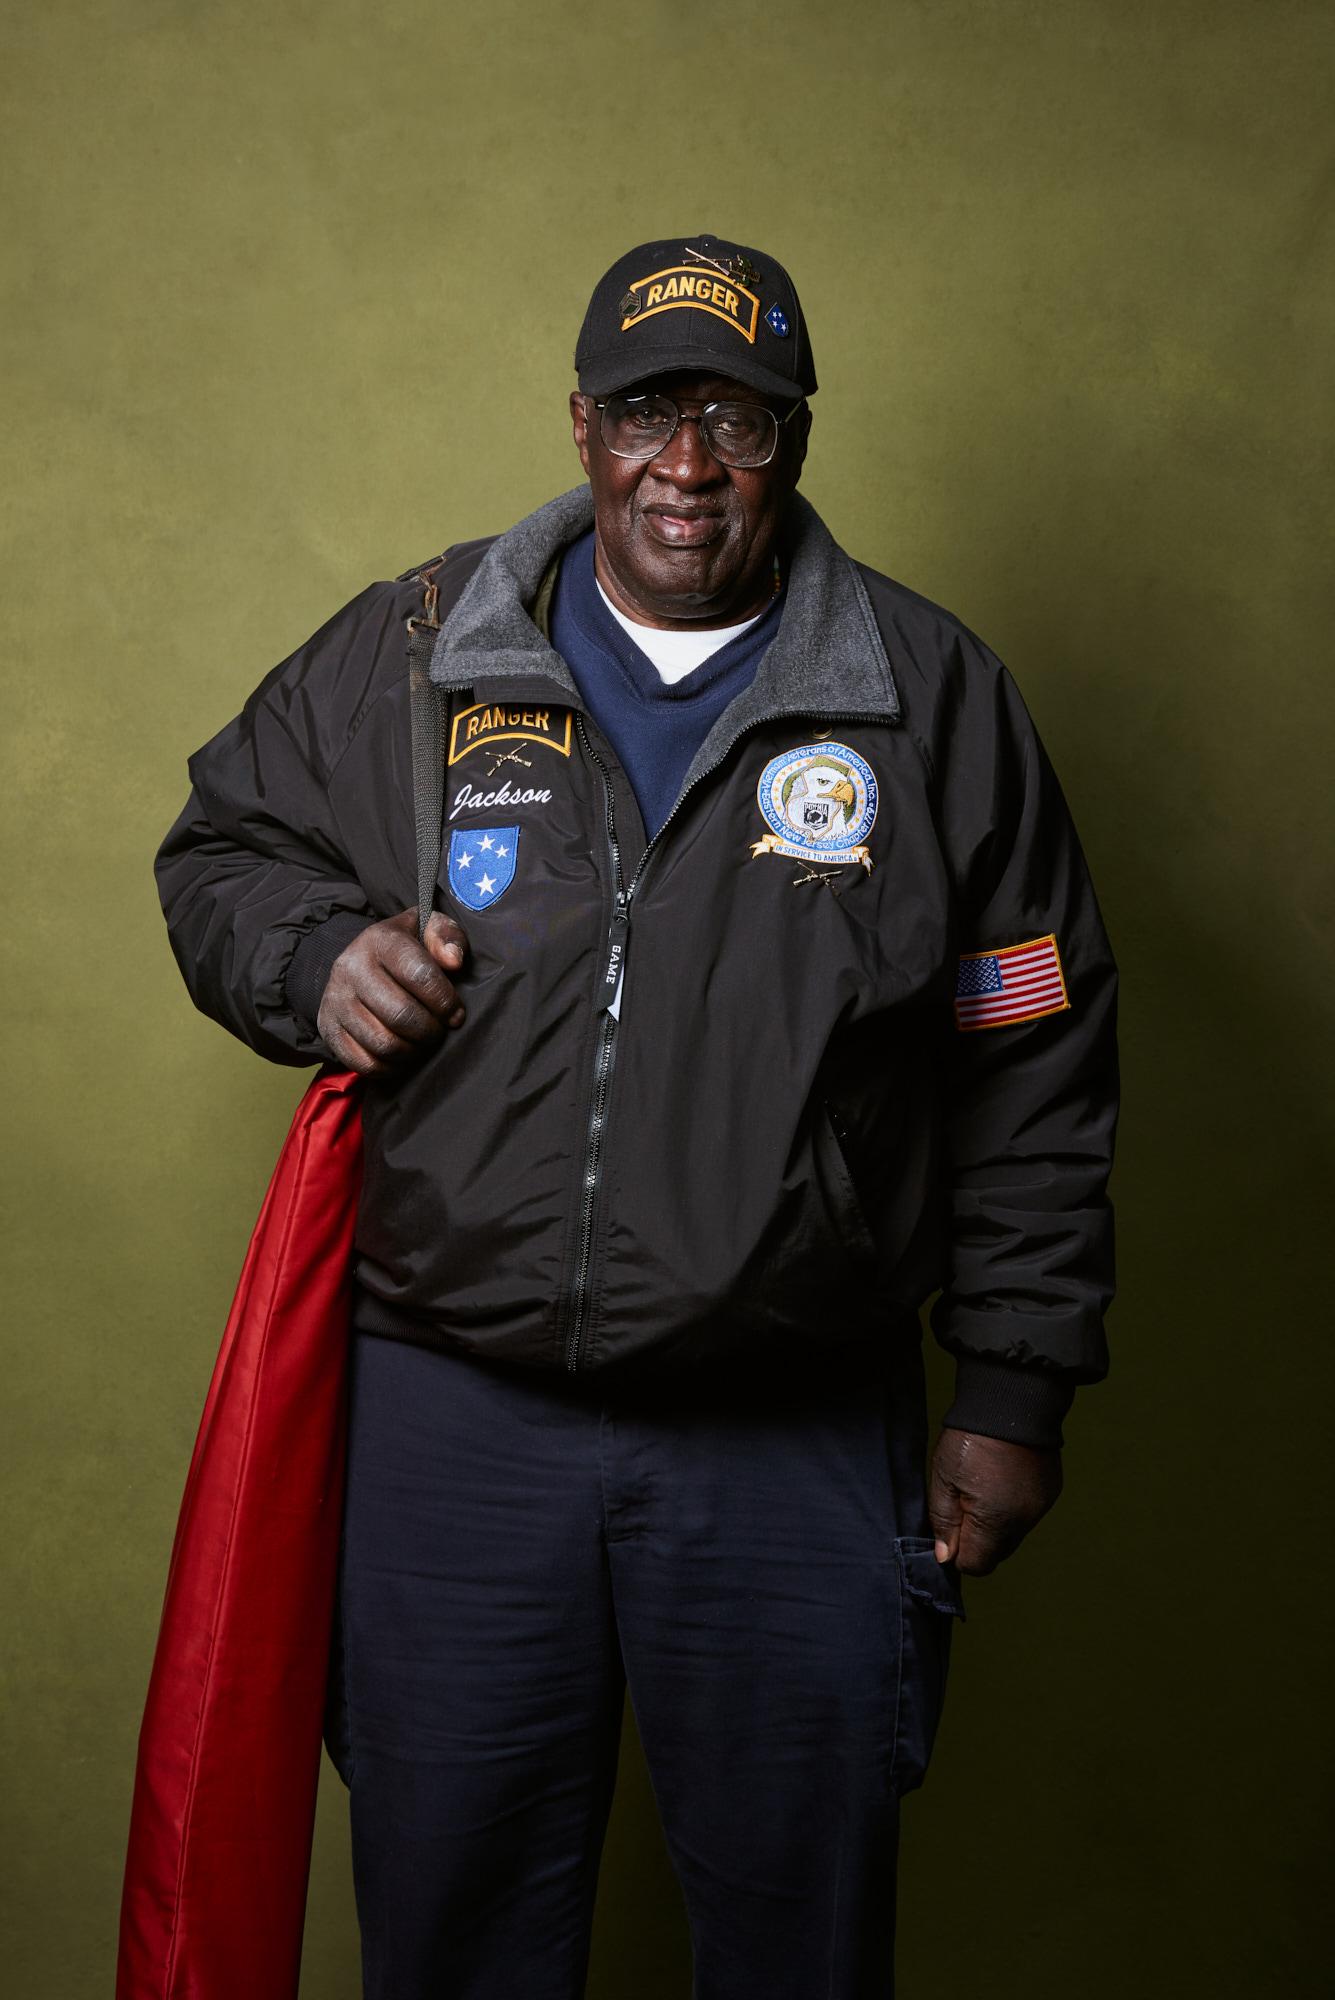 Sergeant Thomas Jackson